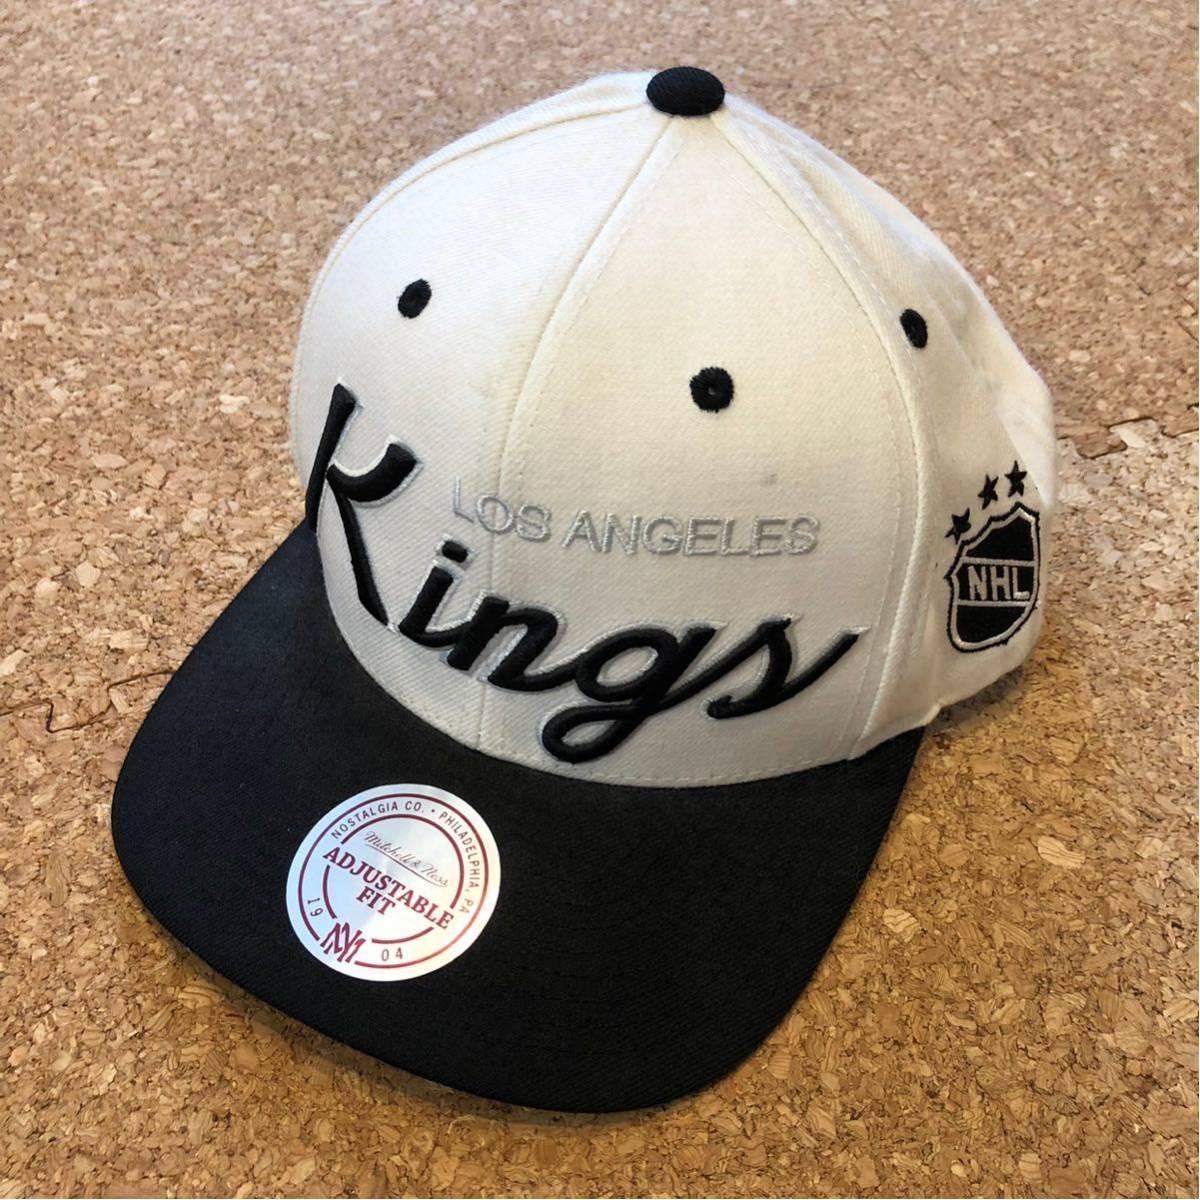 mitchell≠ss NHL losangeles kings キャップ スナップバック 白黒